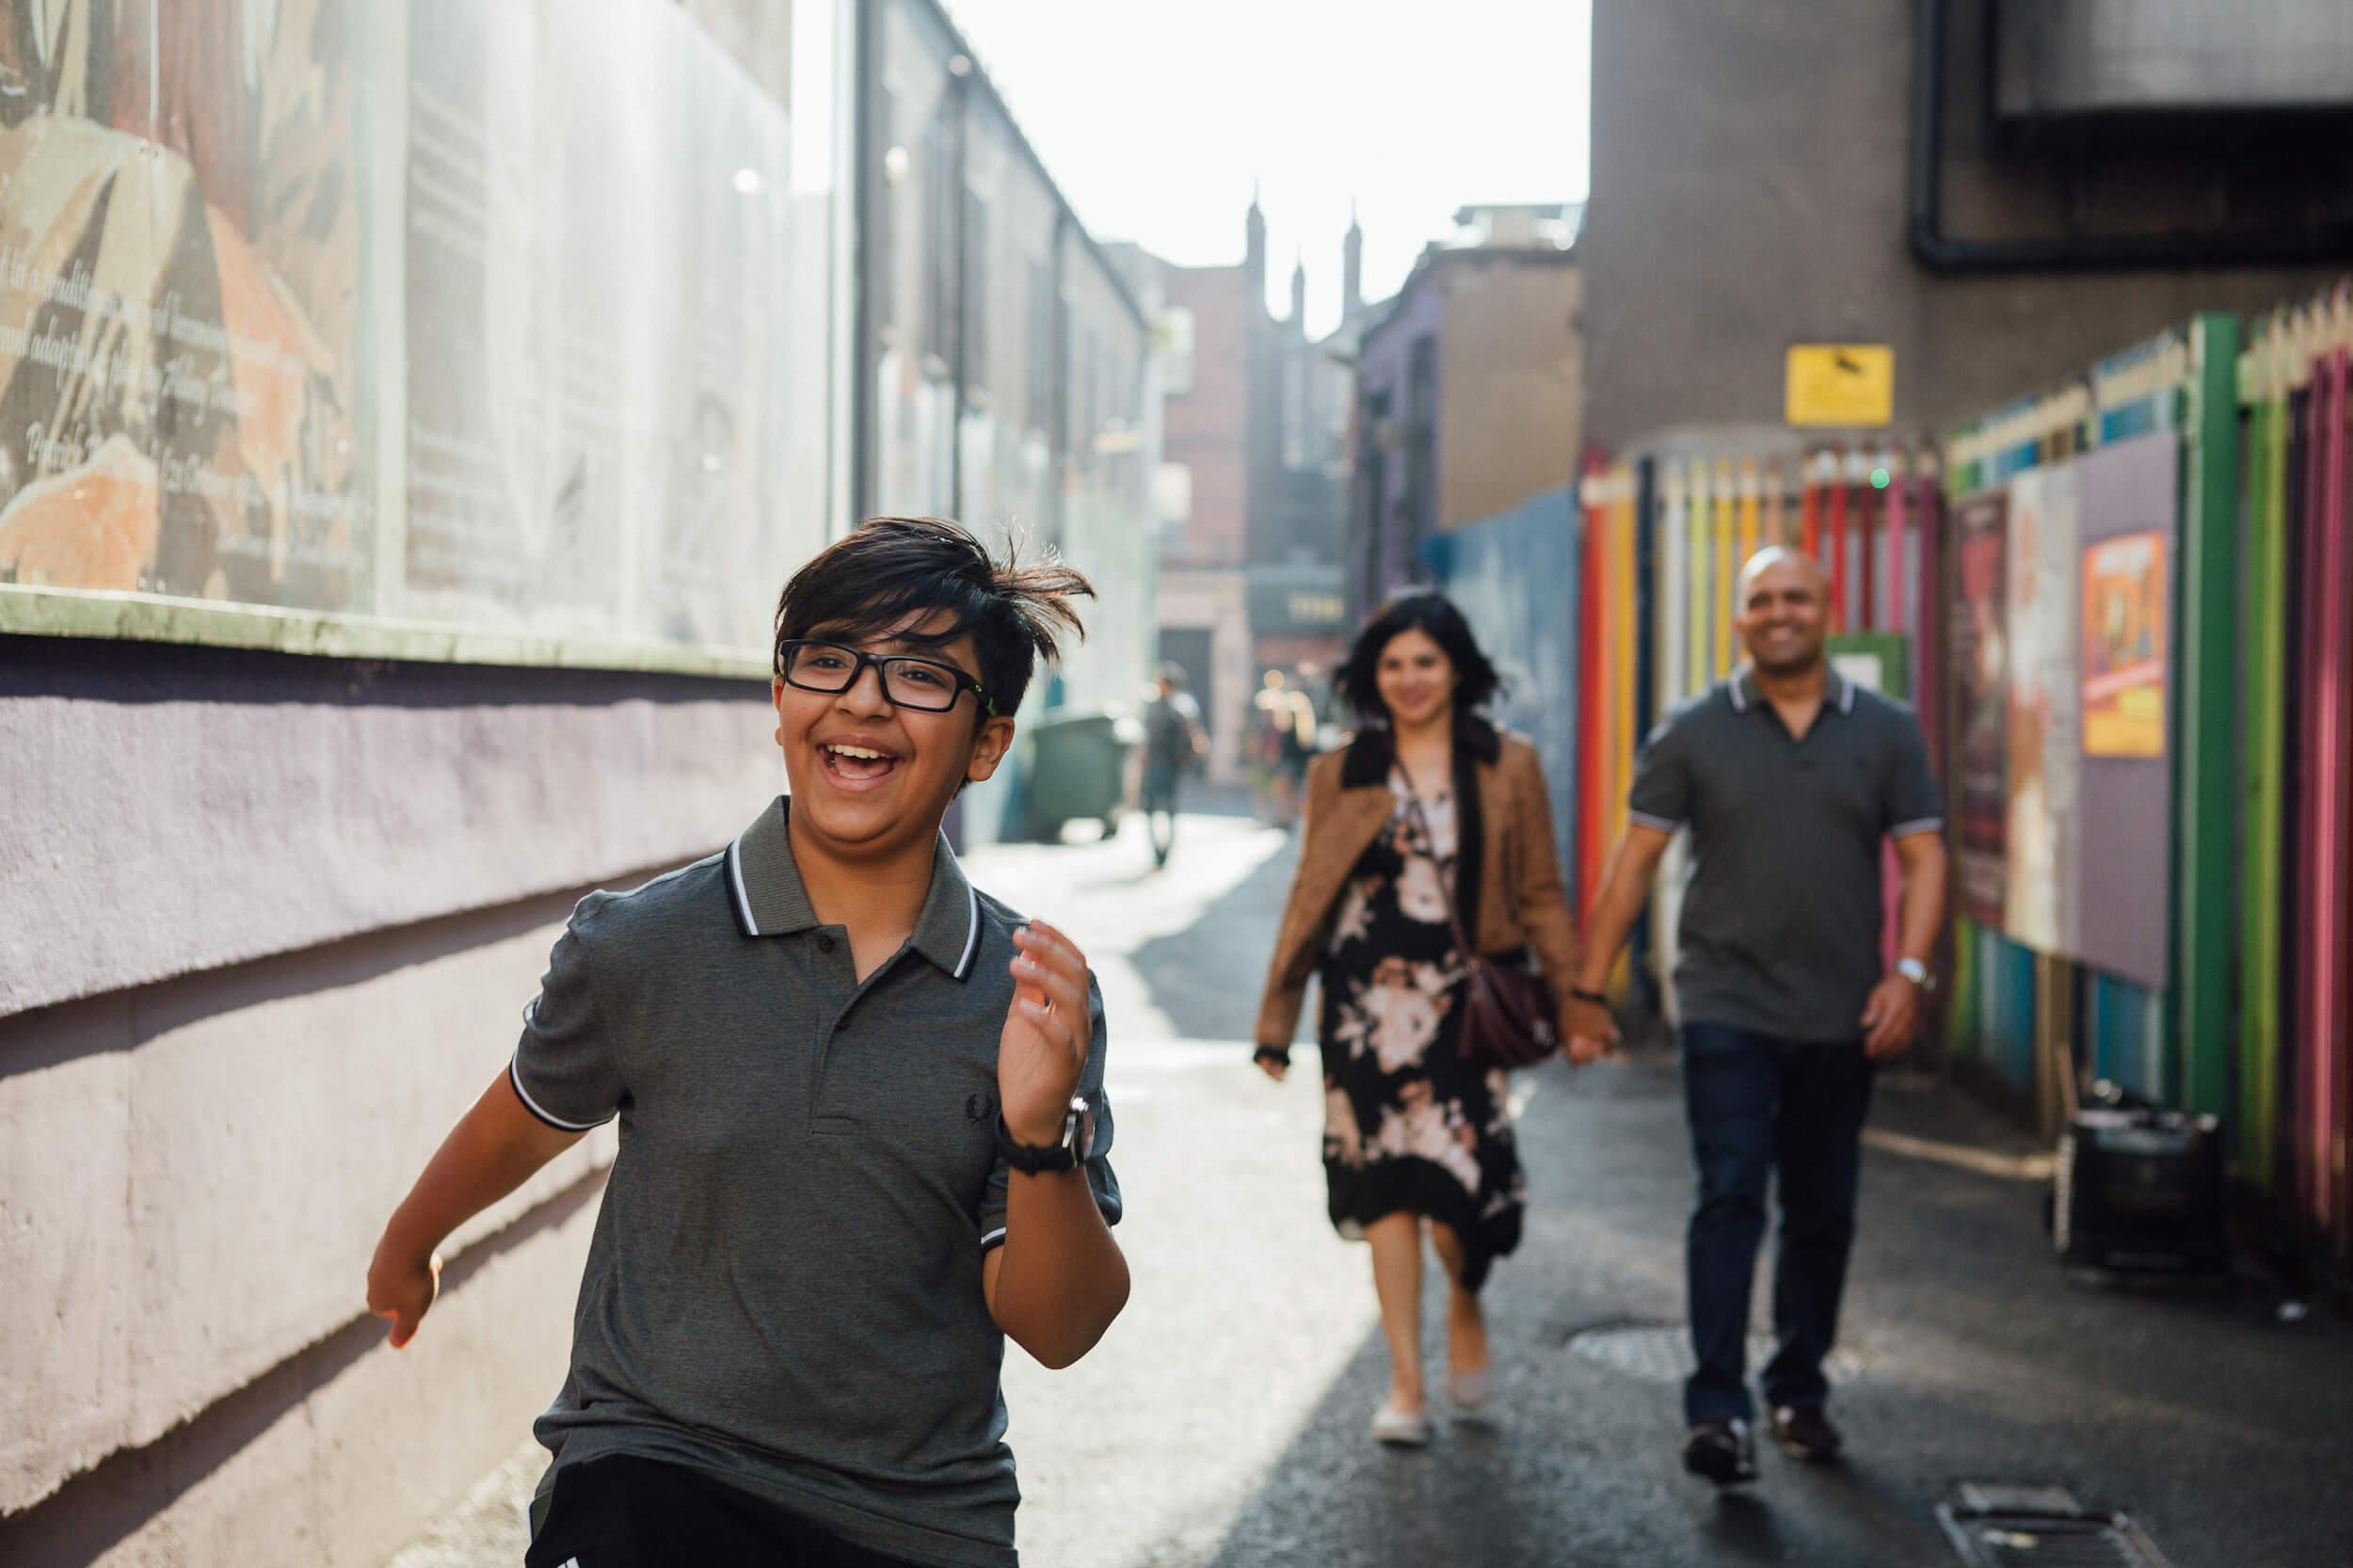 Family vacation culture in Dublin Ireland